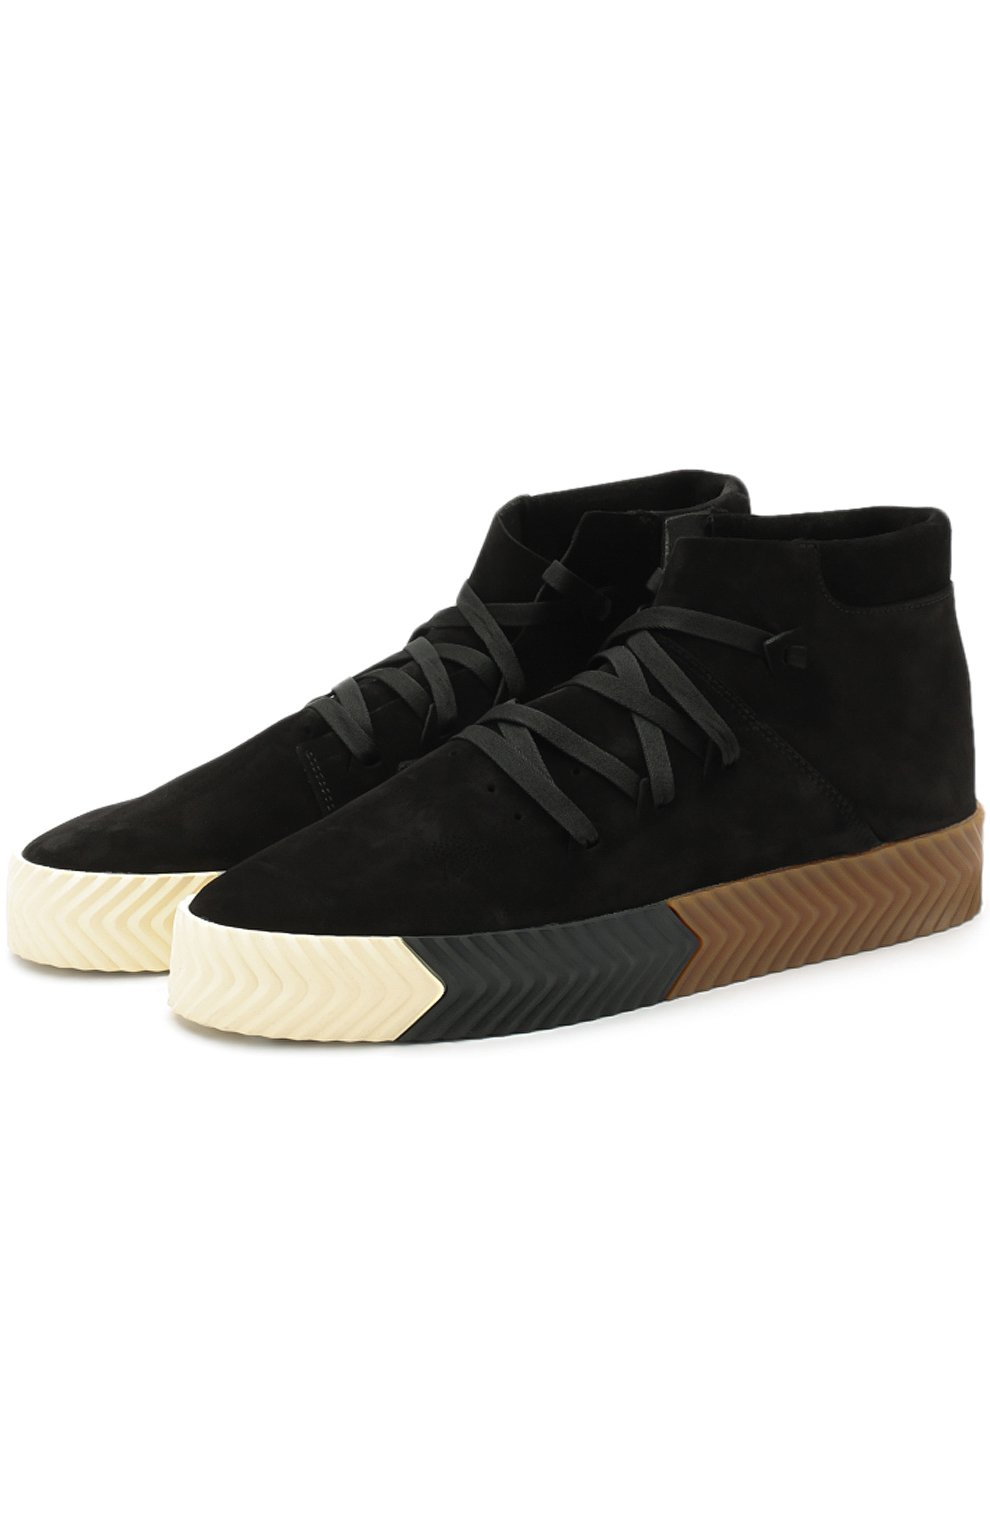 e7a77898 Фото Мужские черные высокие замшевые кеды skate shoes на шнуровке ADIDAS  ORIGINALS BY ALEXANDER WANG Китай